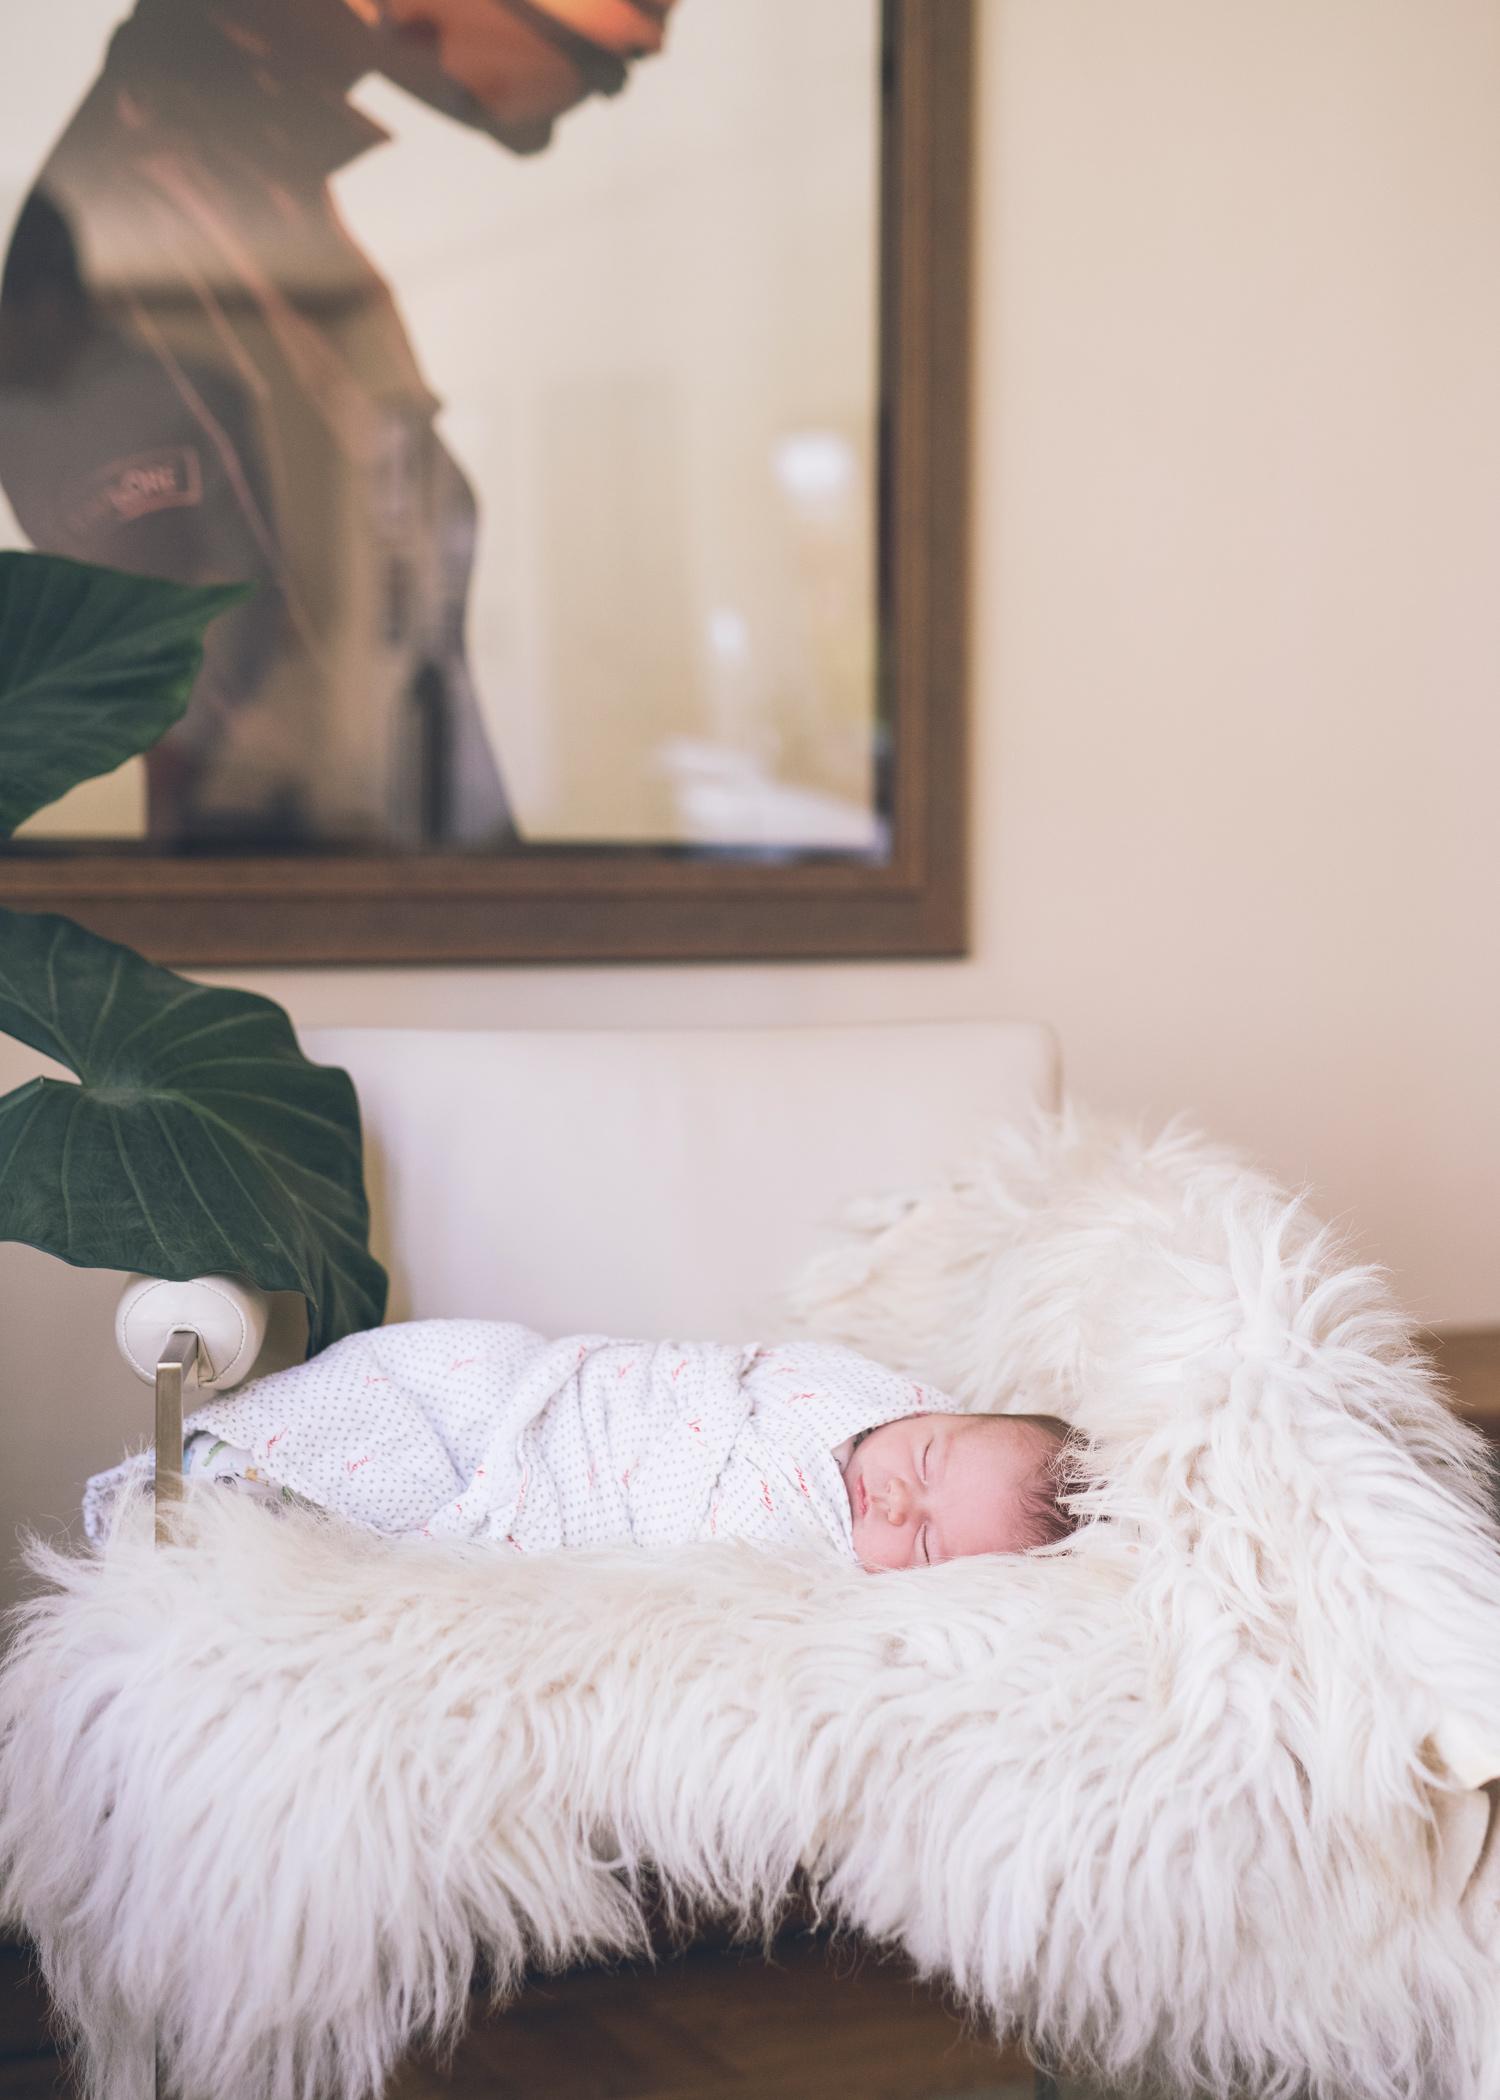 nebworn-baby-sleeping-on-a-furry-throw-on-a-chair.jpg